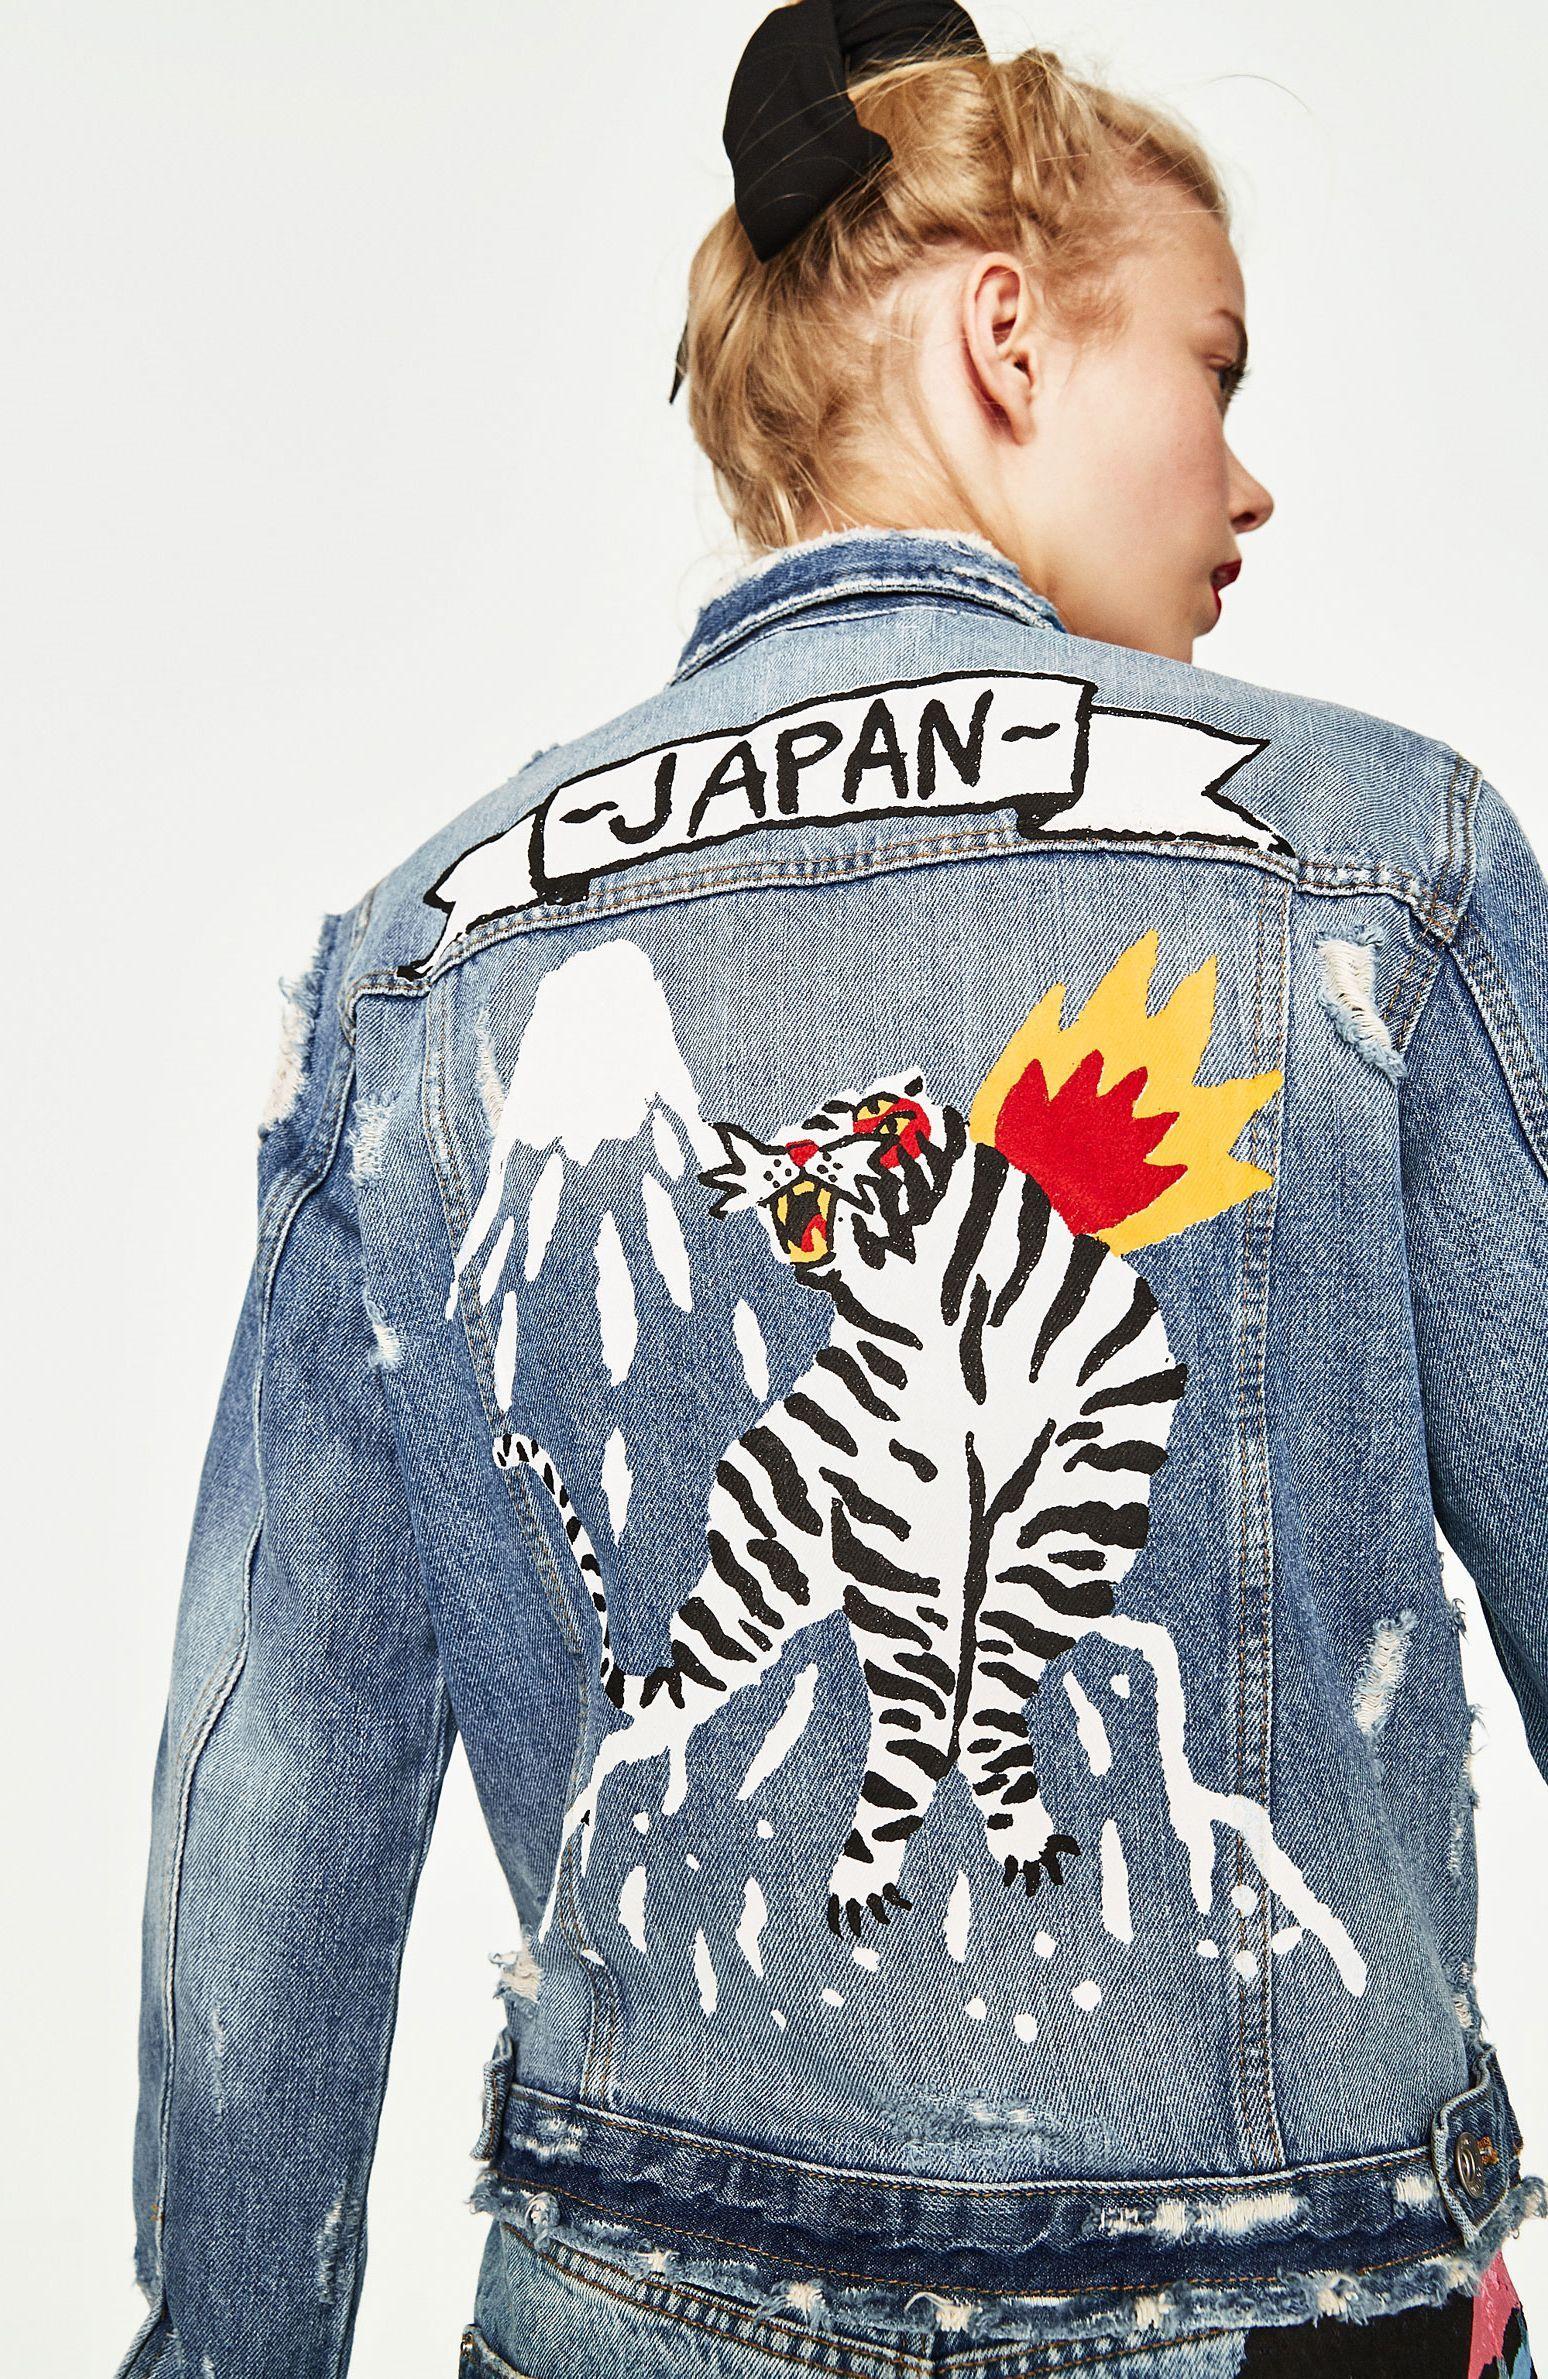 d3a540a8e16 Japan denim jacket by Ricardo Cavolo | Jean Jacket | Painted denim ...